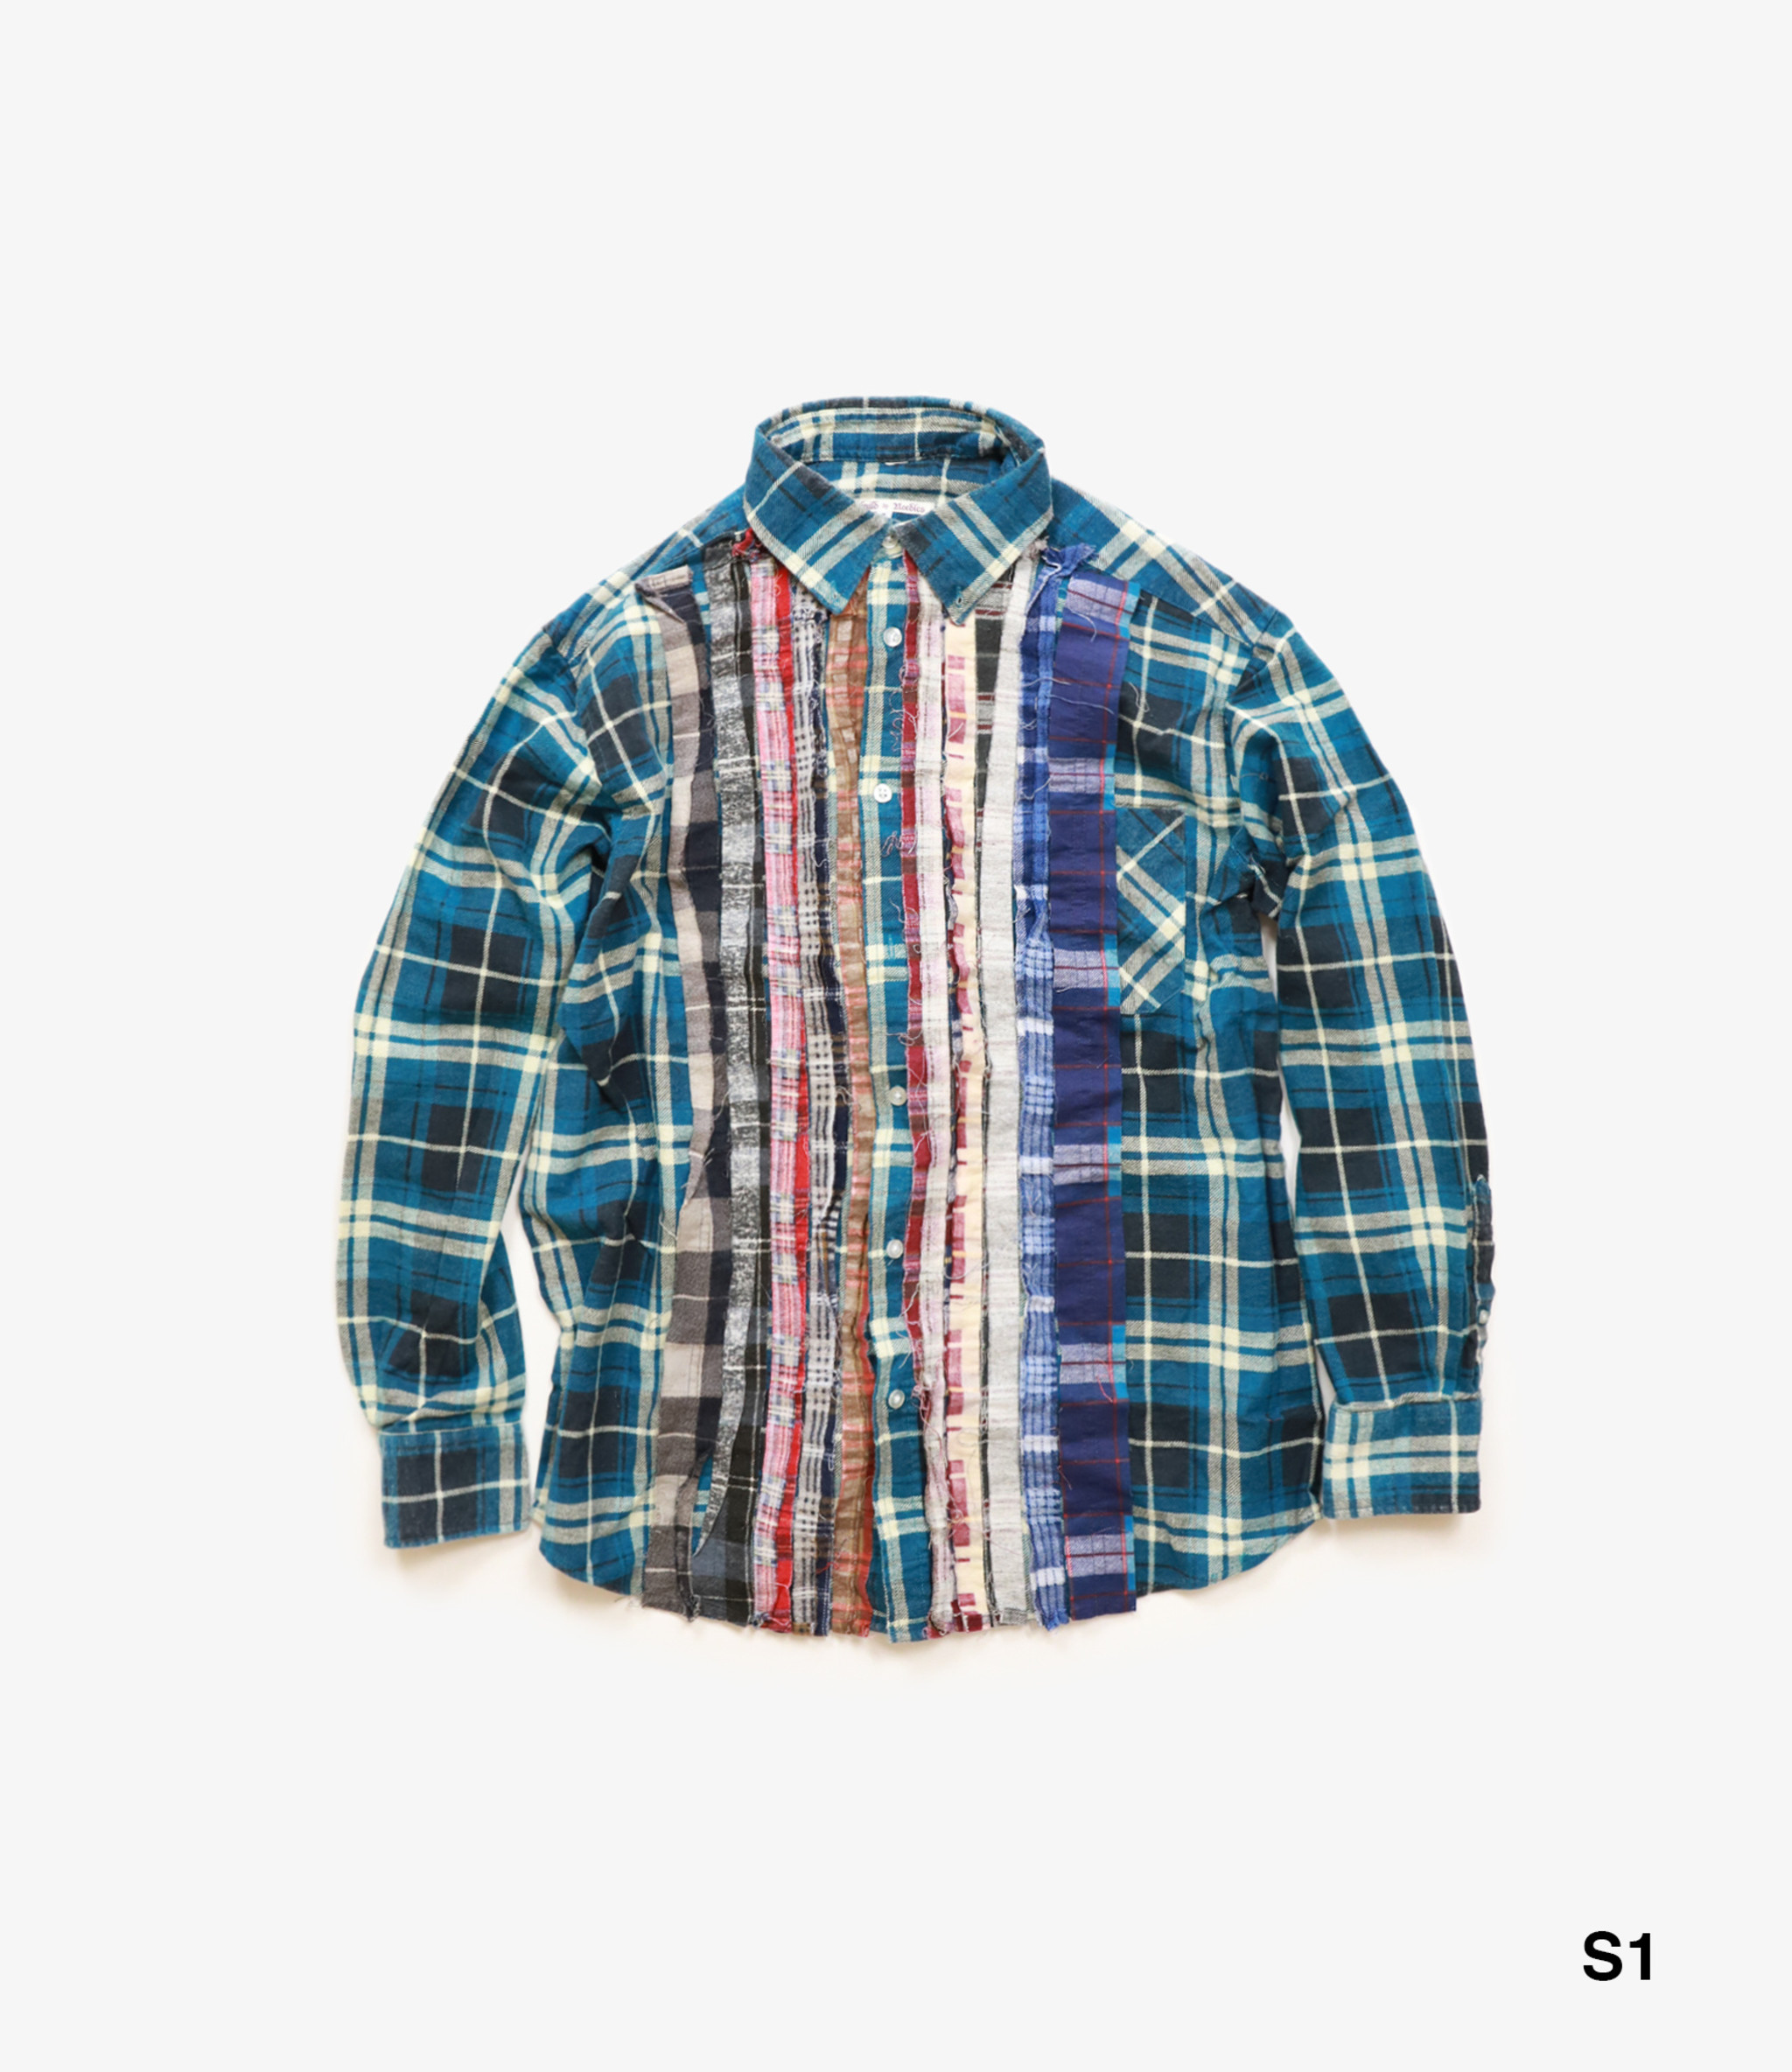 Needles Rebuild by Needles Flannel Shirt - Ribbon Shirt